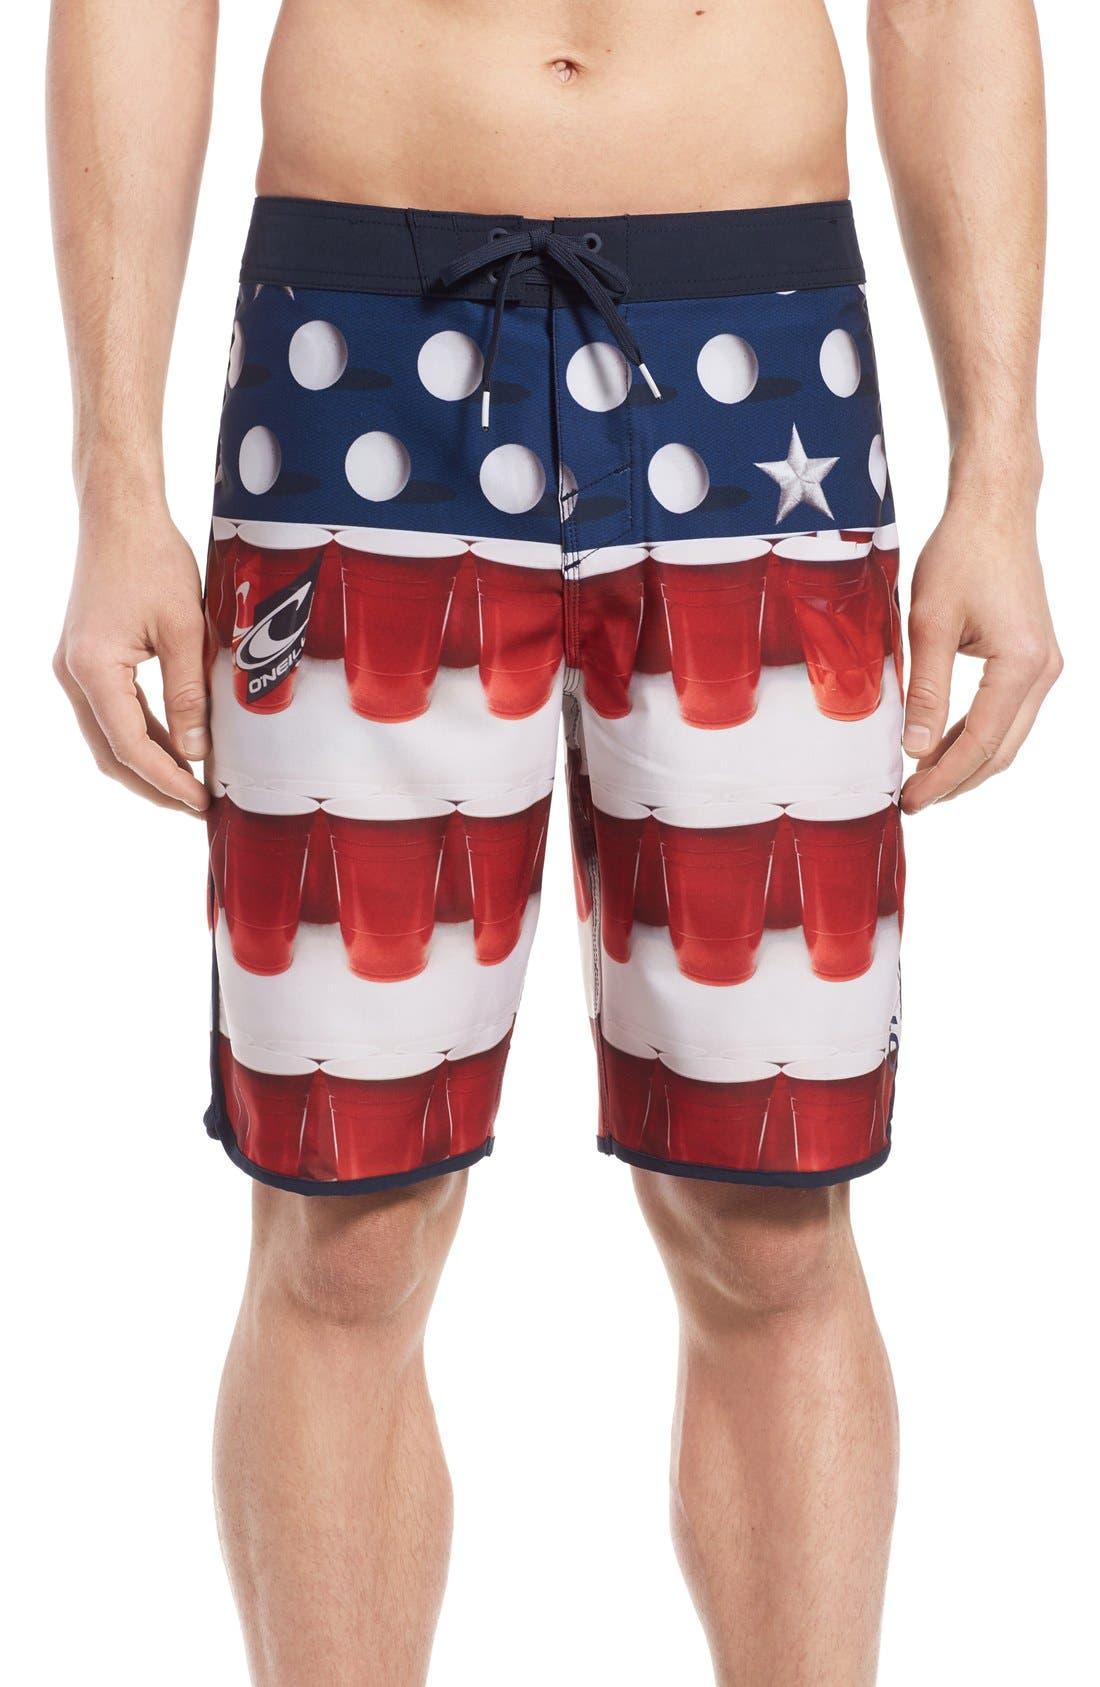 O'NEILL 'Hyperfreak - Beer Pong' Board Shorts, Main, color, 600